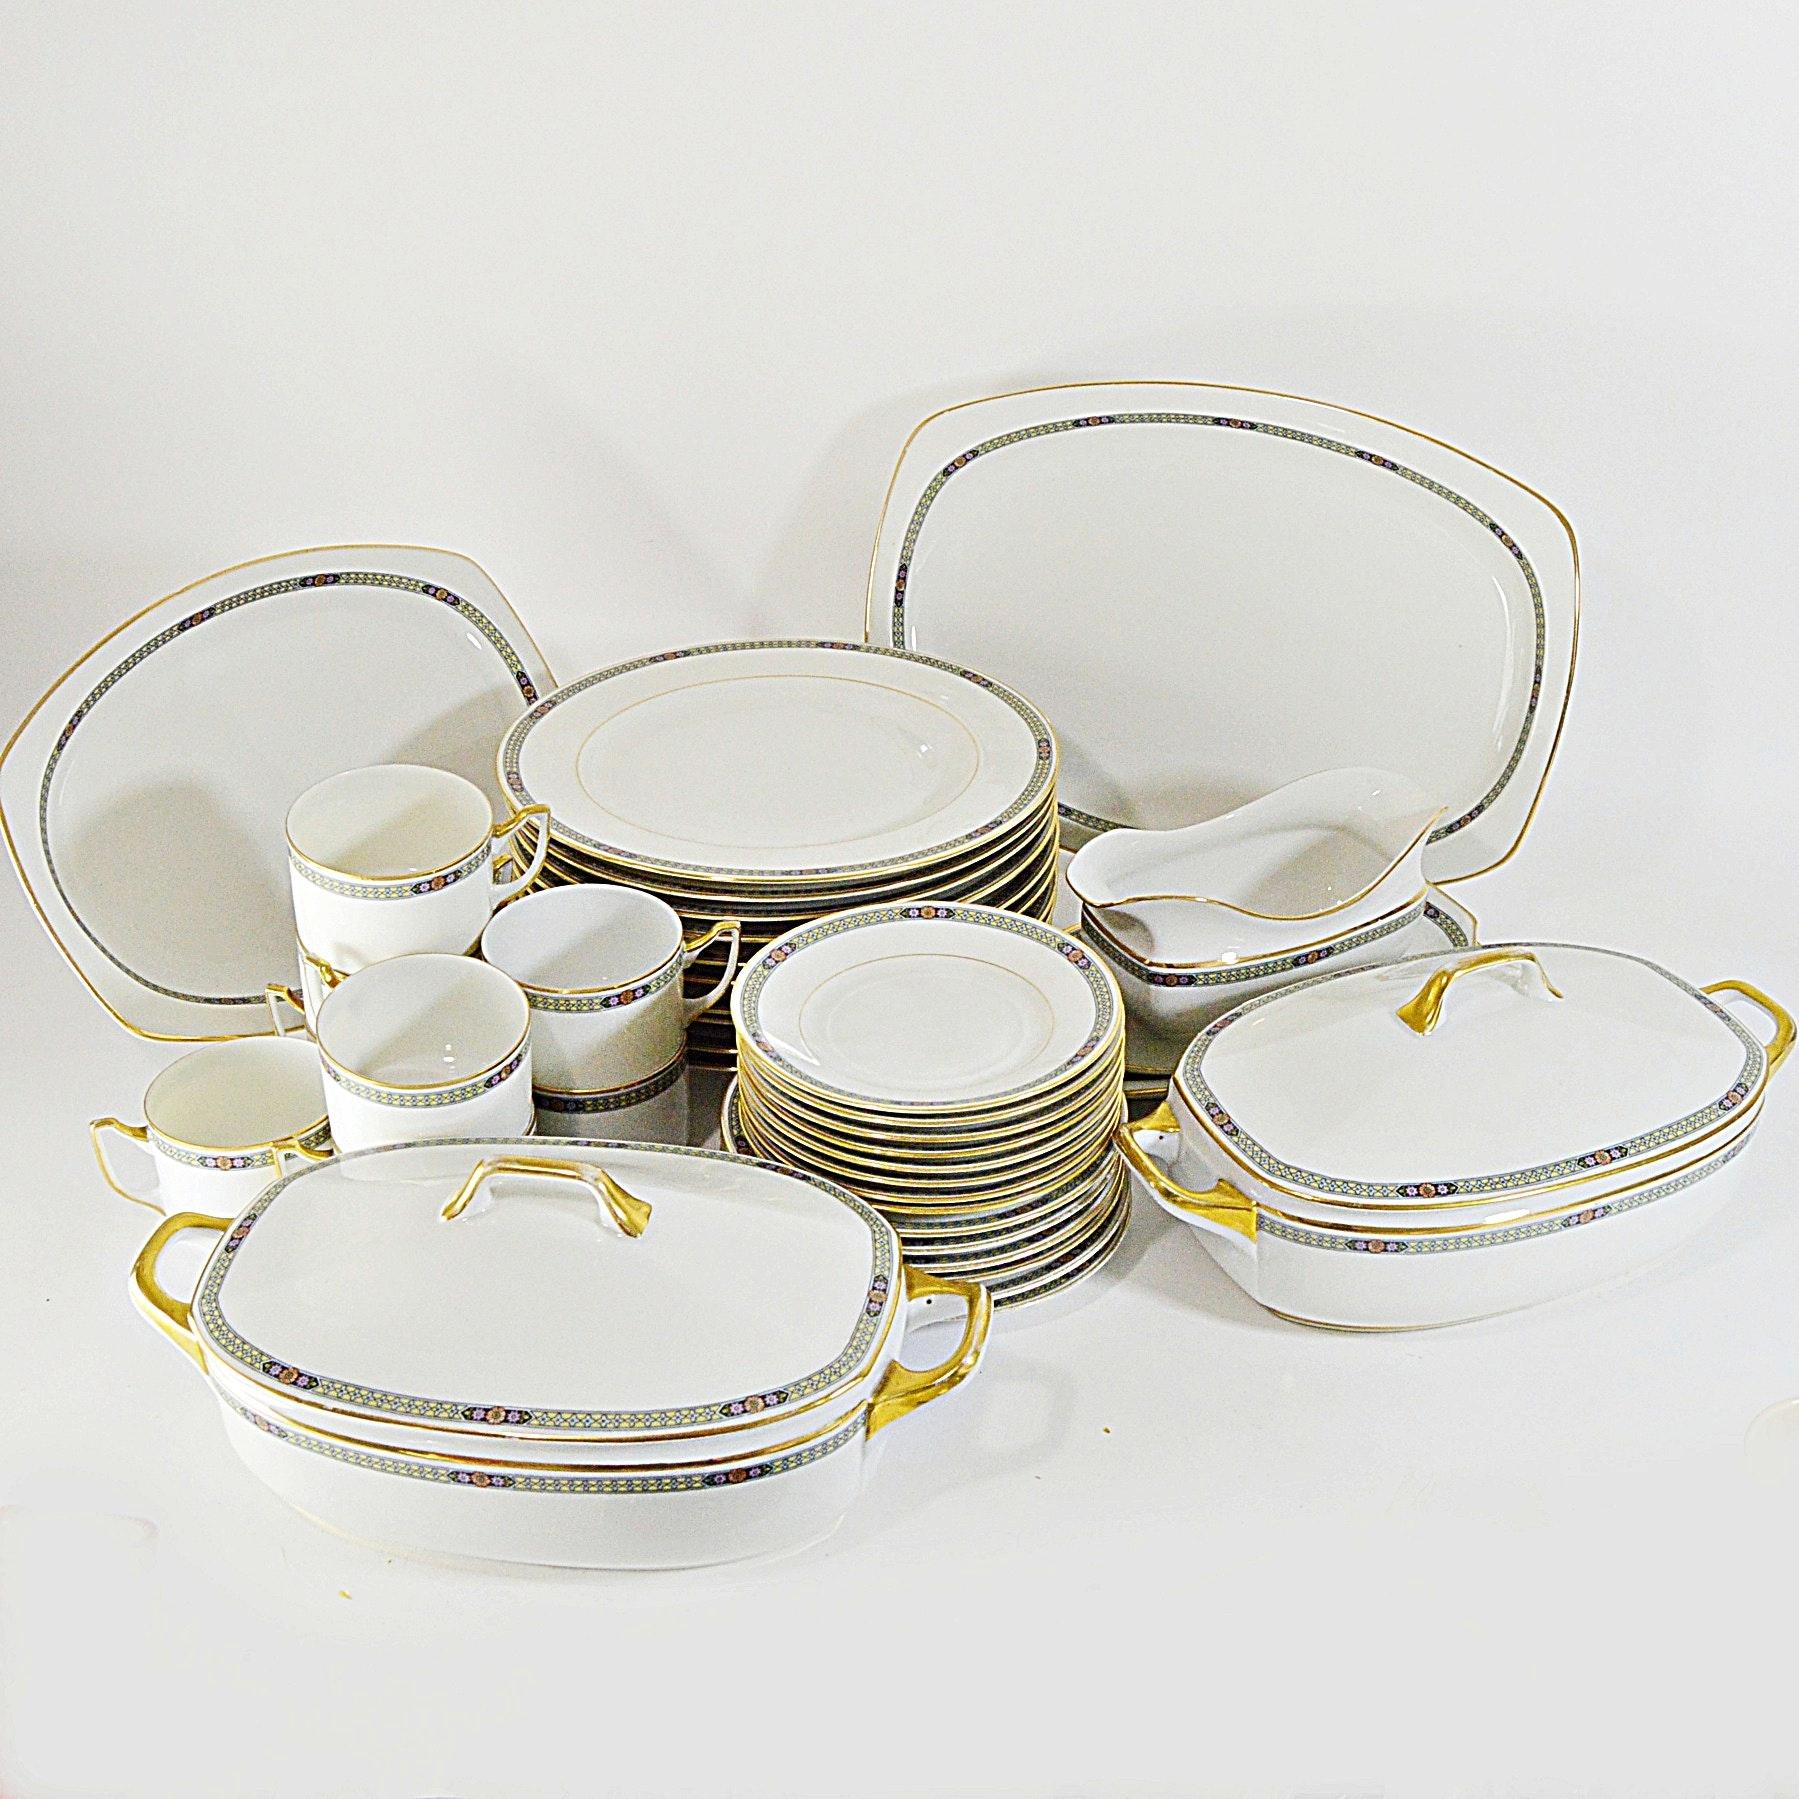 Set of Vintage Czechoslovakian Epiag Porcelain Dinnerware